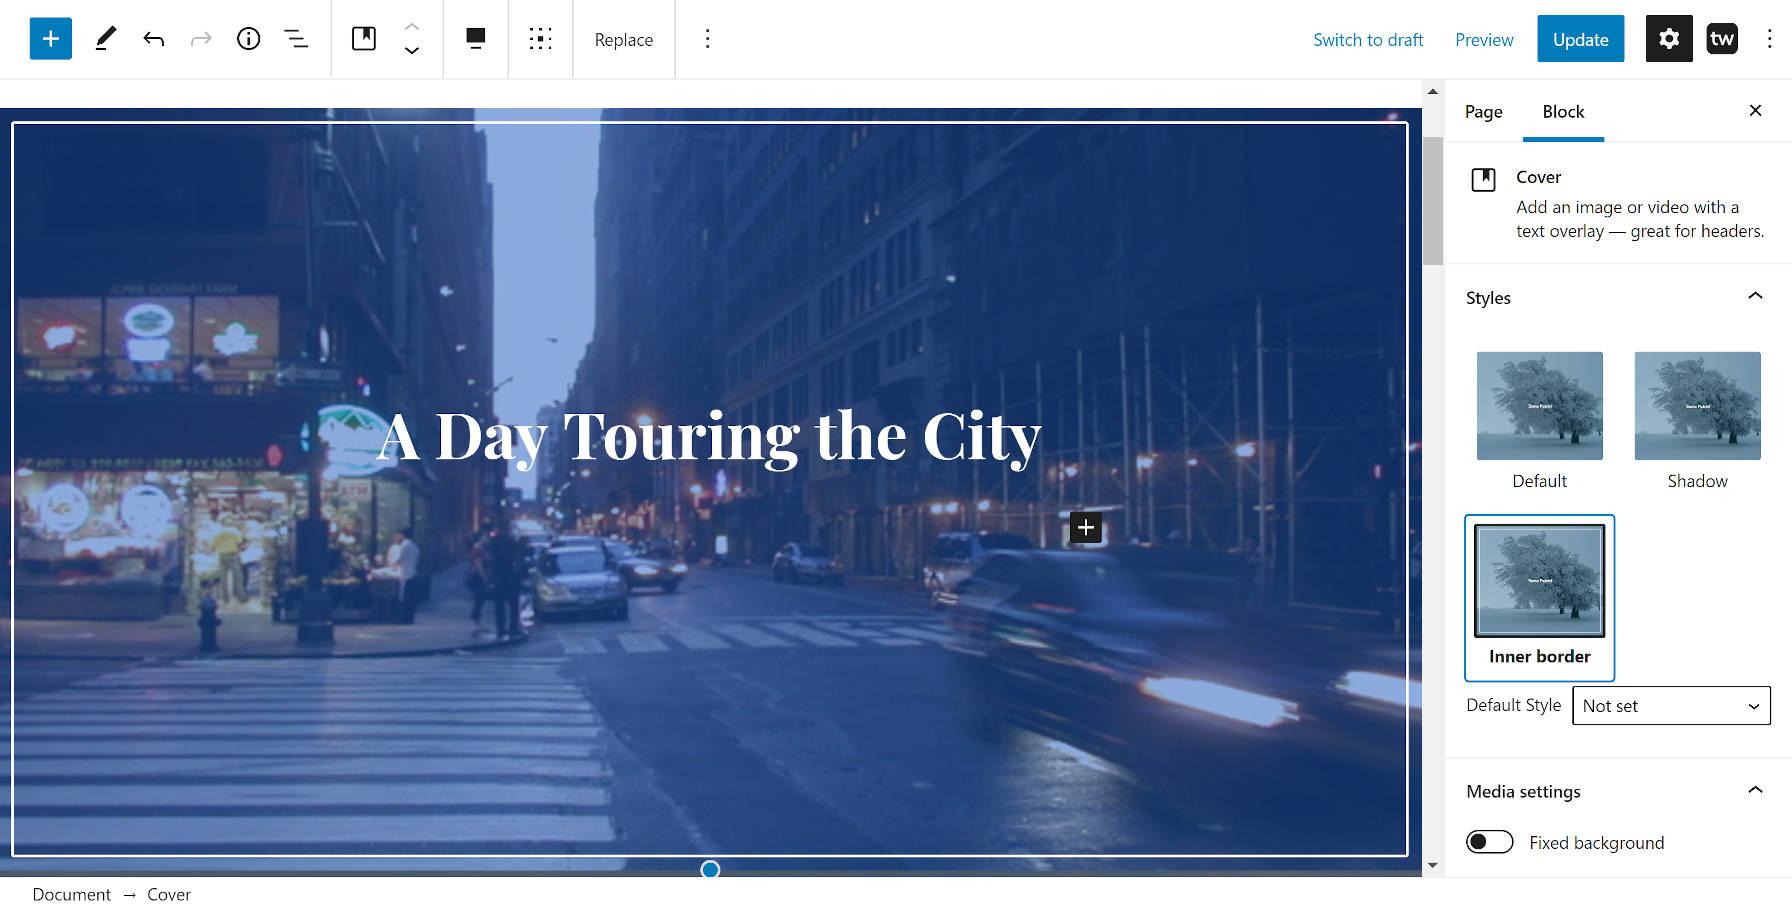 Custom inner border style from the Twentig WordPress plugin on the Cover block.